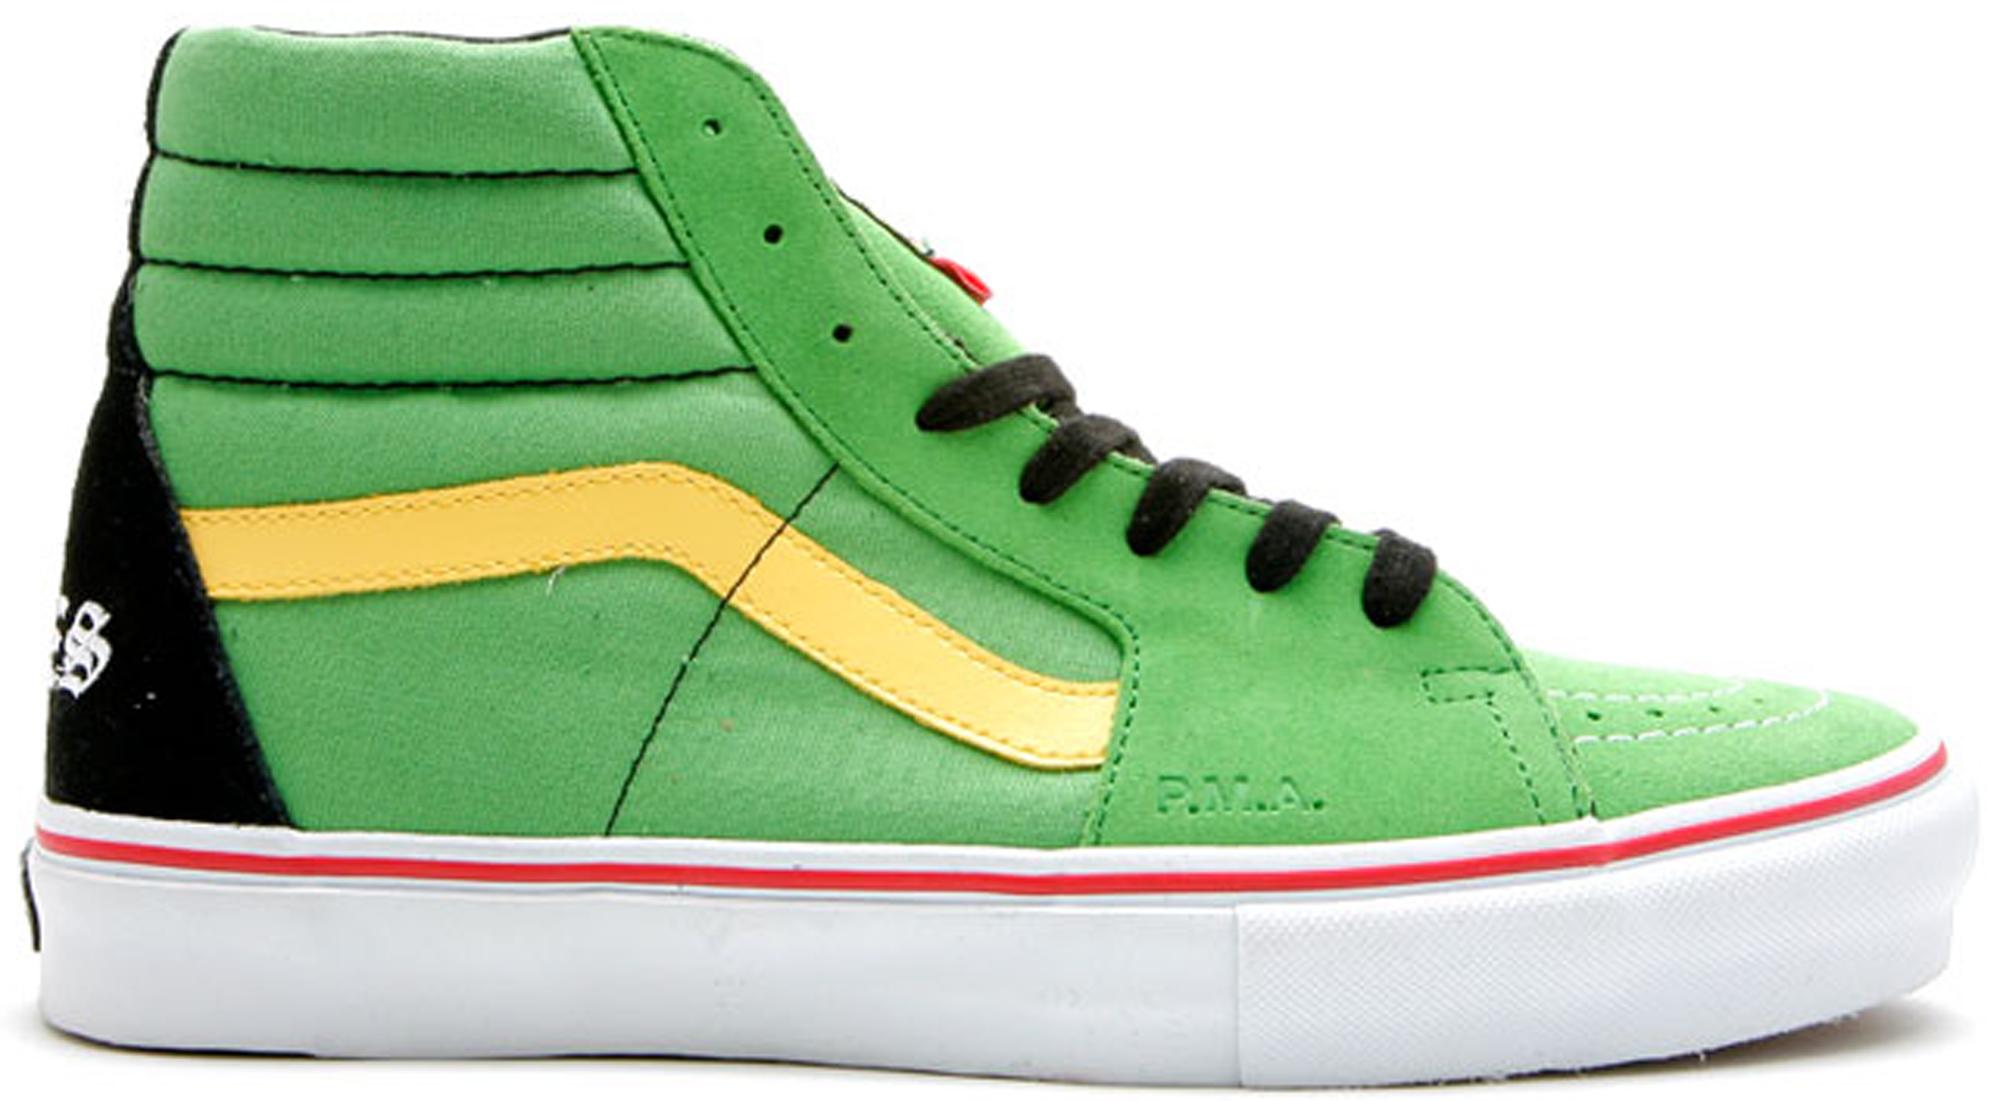 Vans Sk8-Hi Supreme x Bad Brains Green